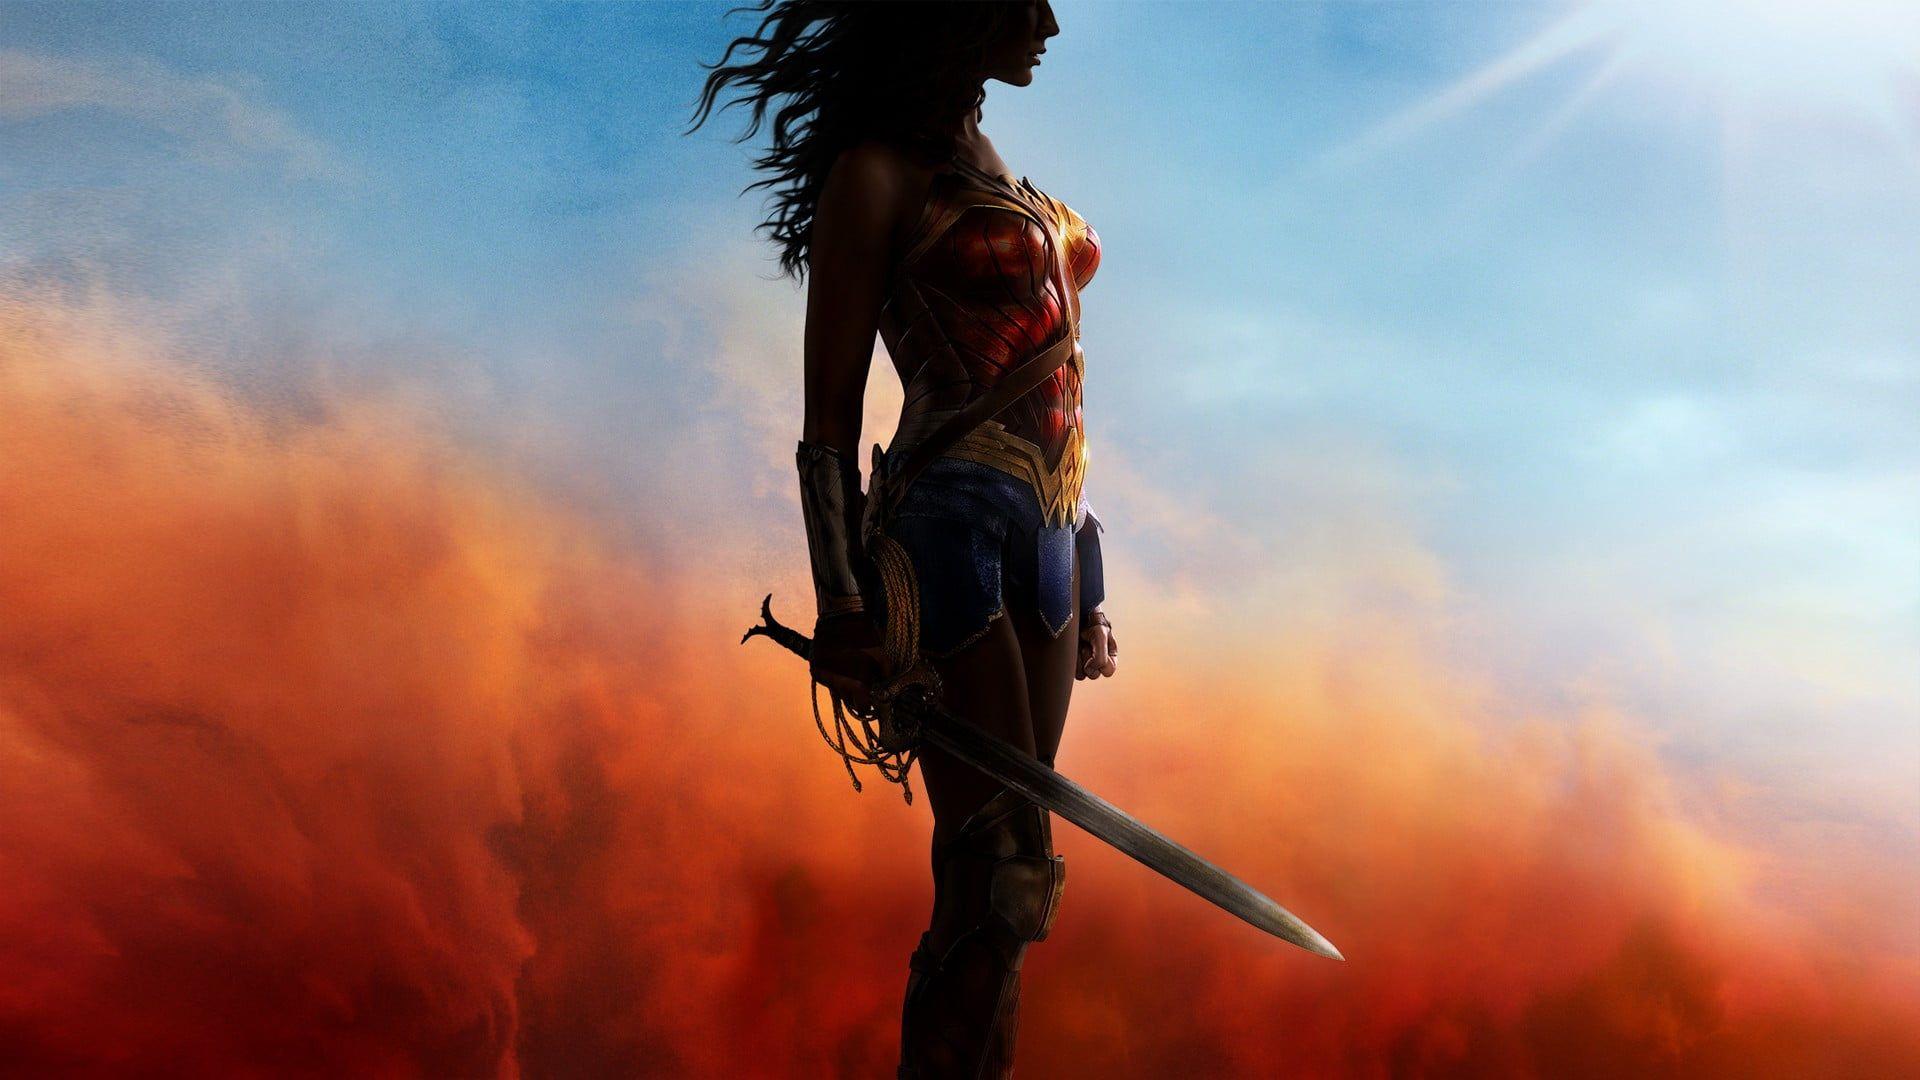 Dc Wonder Woman Wallpaper Gal Gadot Wonder Woman Dc Comics Film Posters 1080p Wallpaper Hdwallpaper D In 2020 Wonder Woman Movie Wonder Woman Wonder Woman Pictures